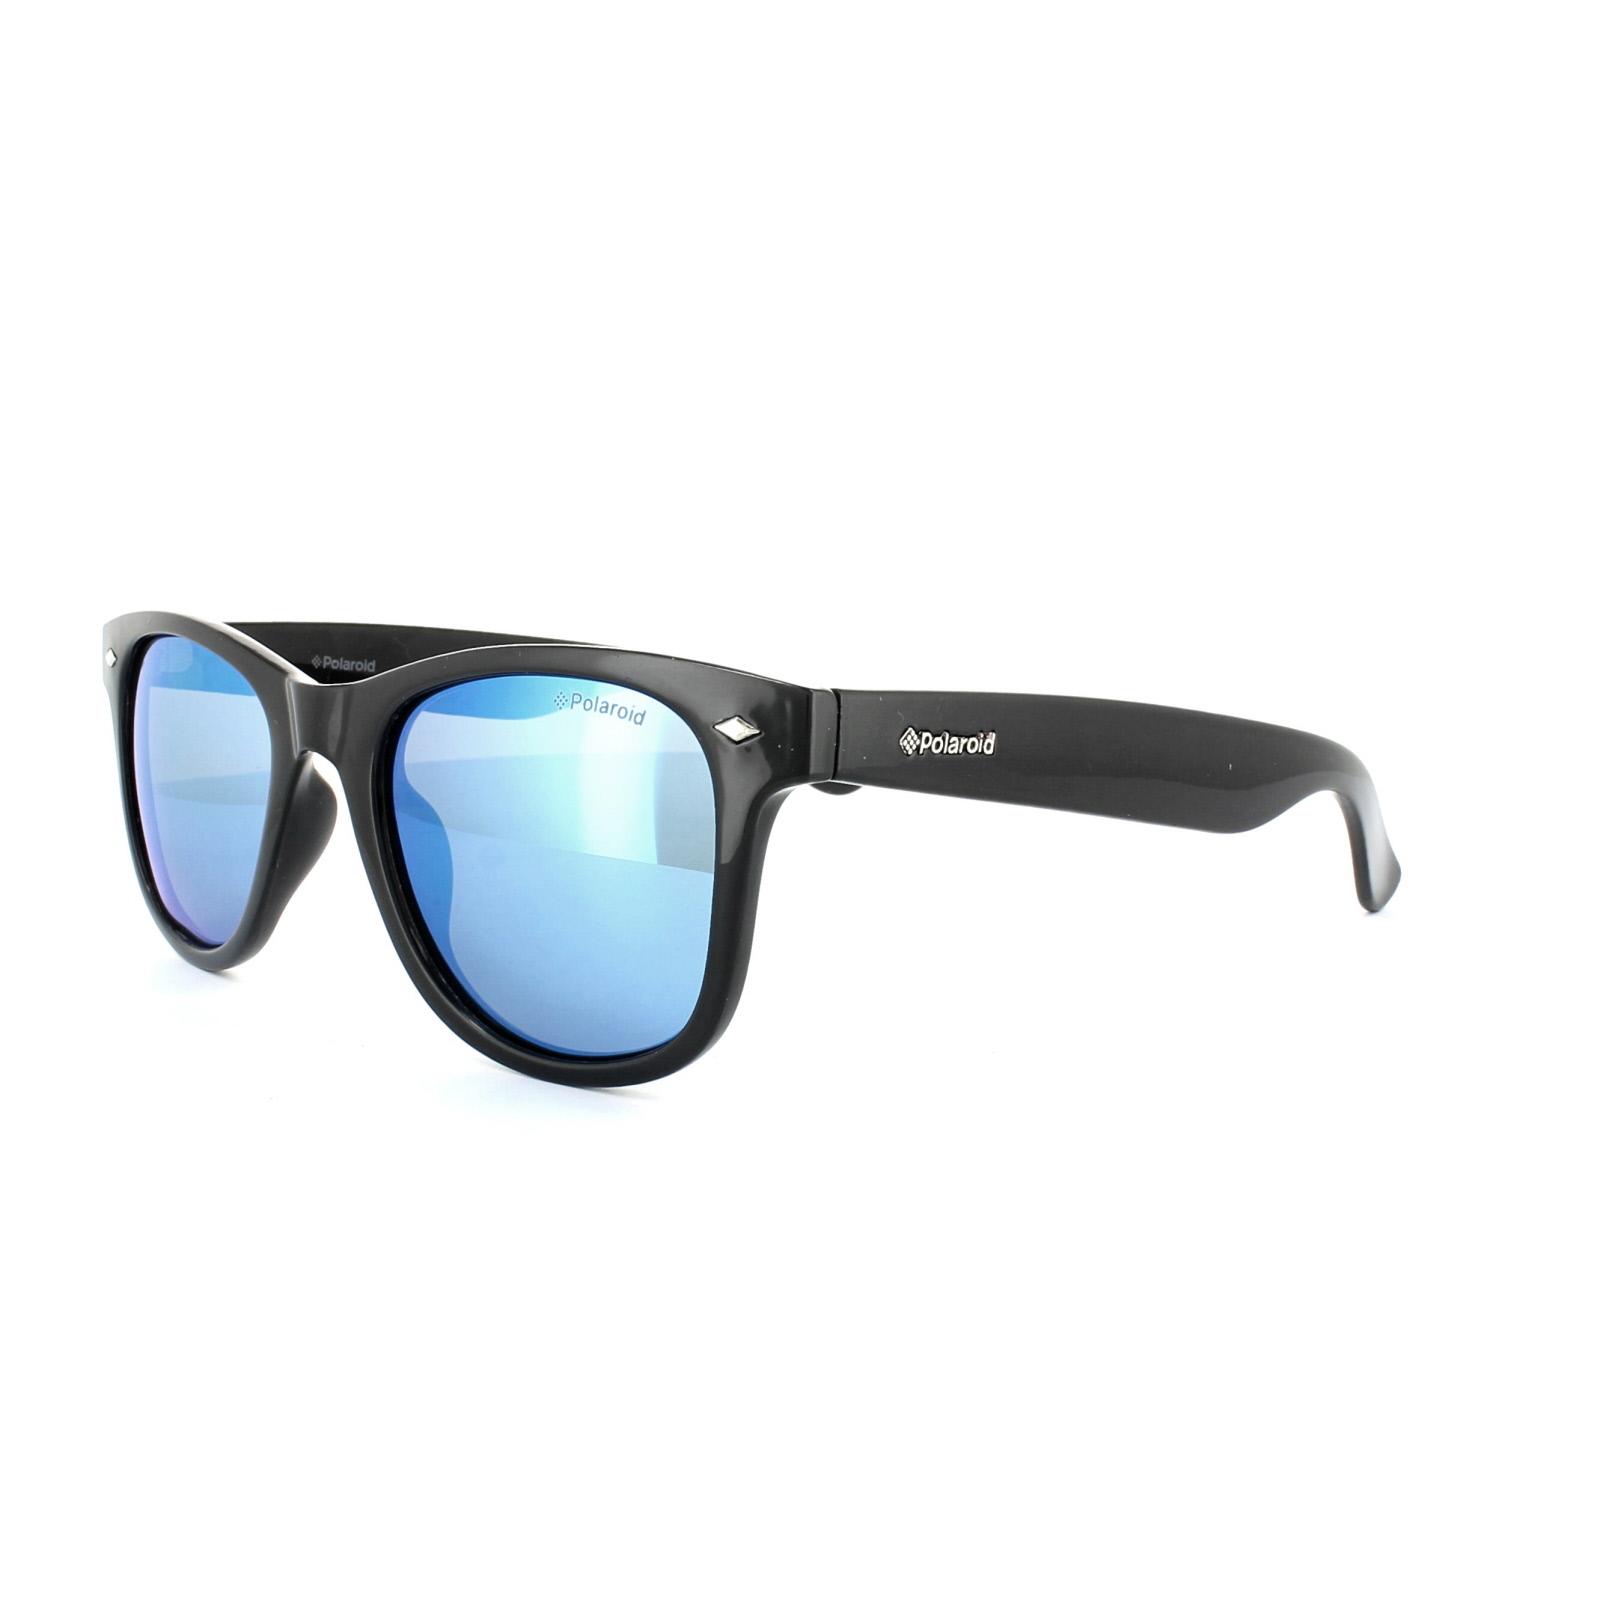 Polaroid Sunglasses 6009/S M D28 JY Black Blue Mirror ...